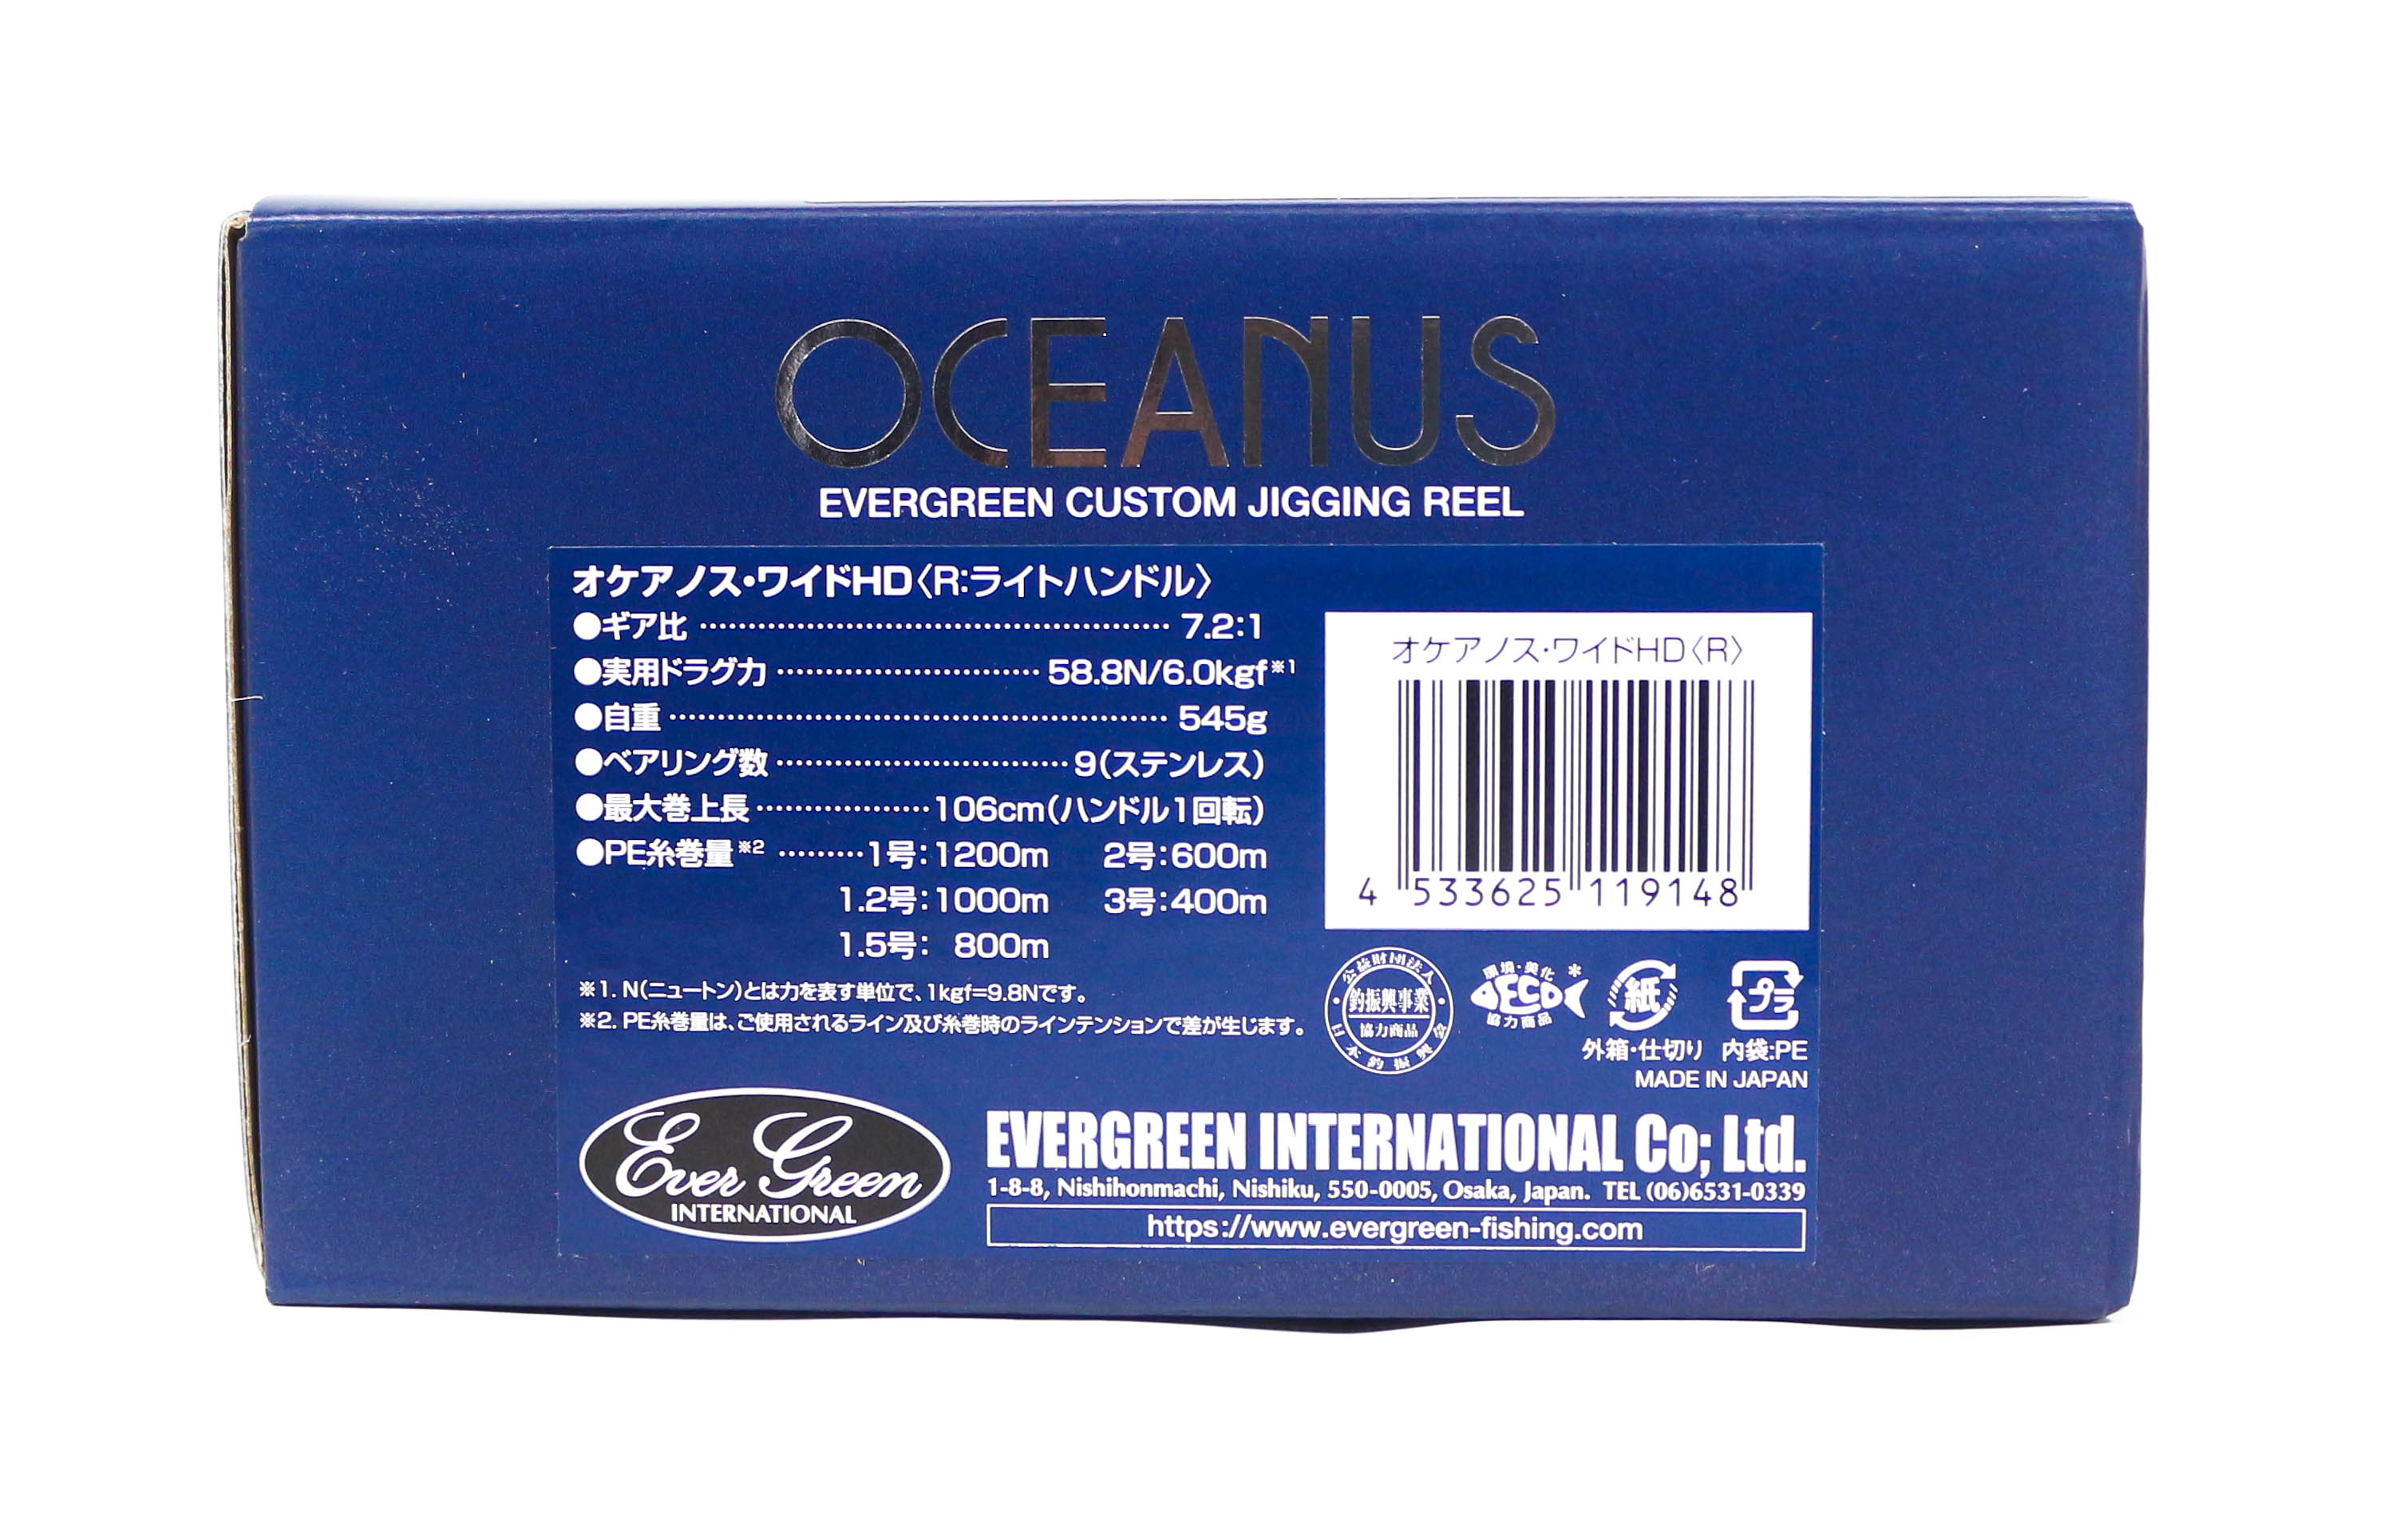 Evergreen Baitcast Reel Oceanus Wide HD Right Hand (9148)